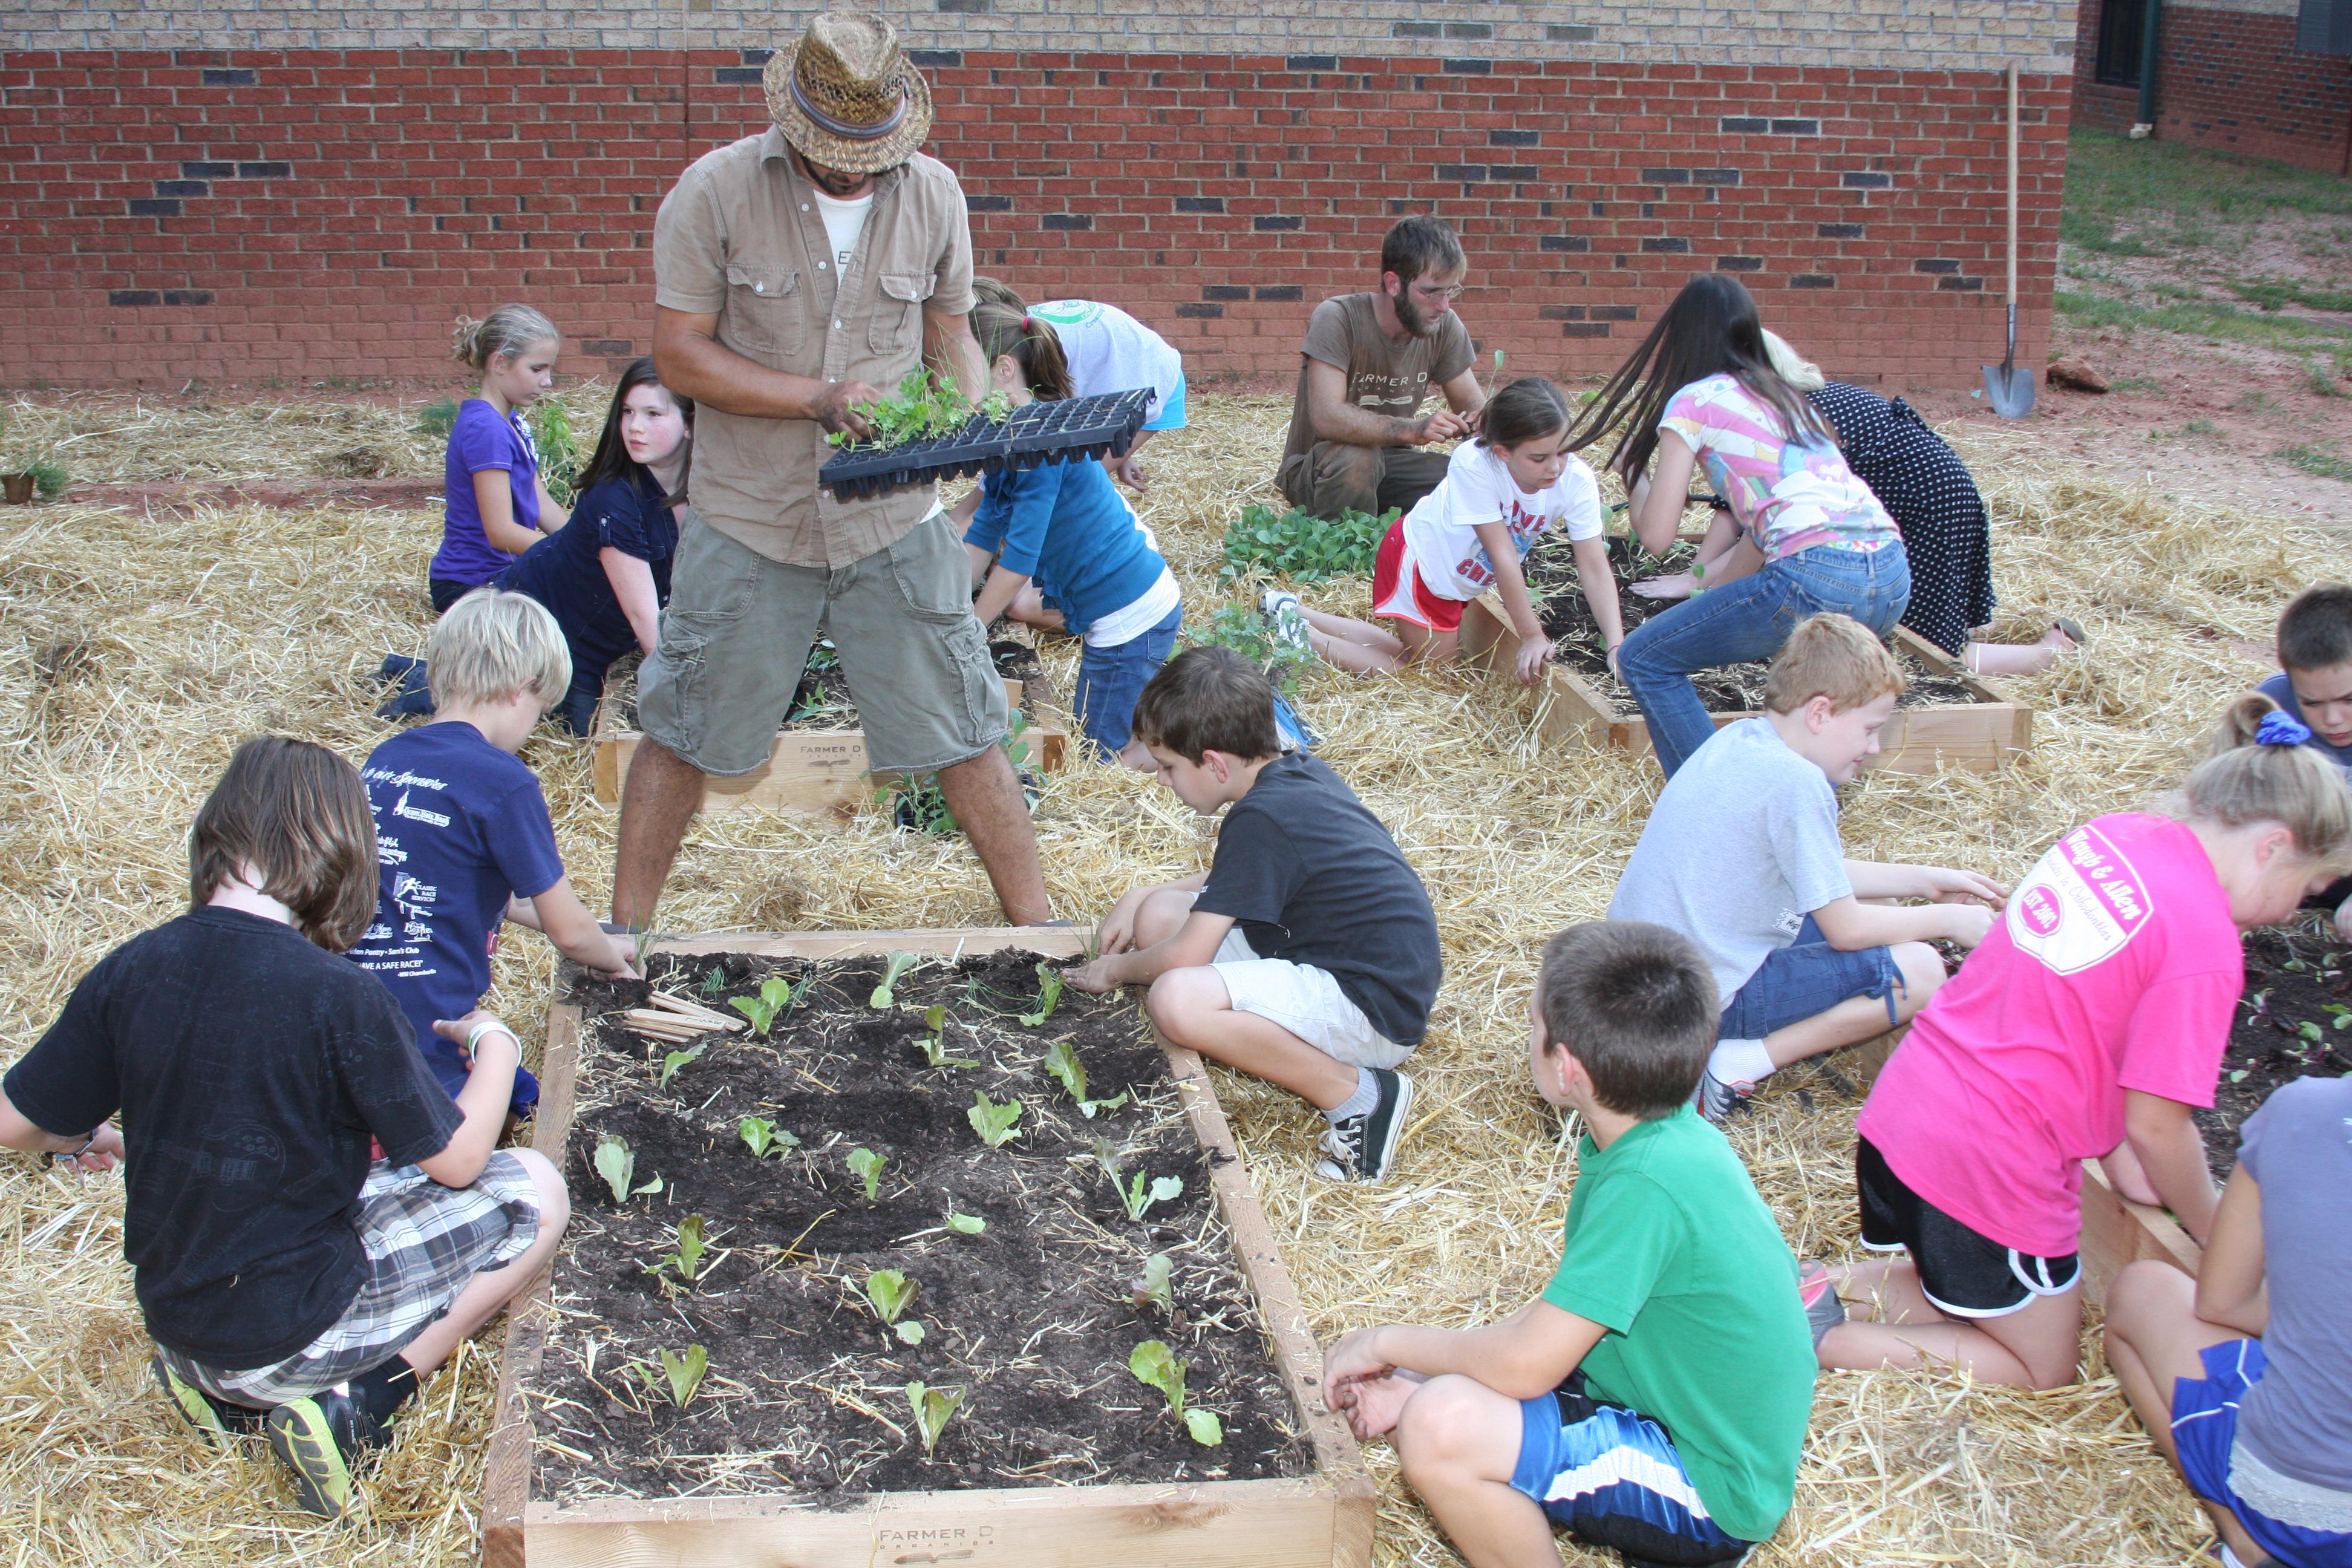 Students work in a school garden at High Shoals Elementary School.